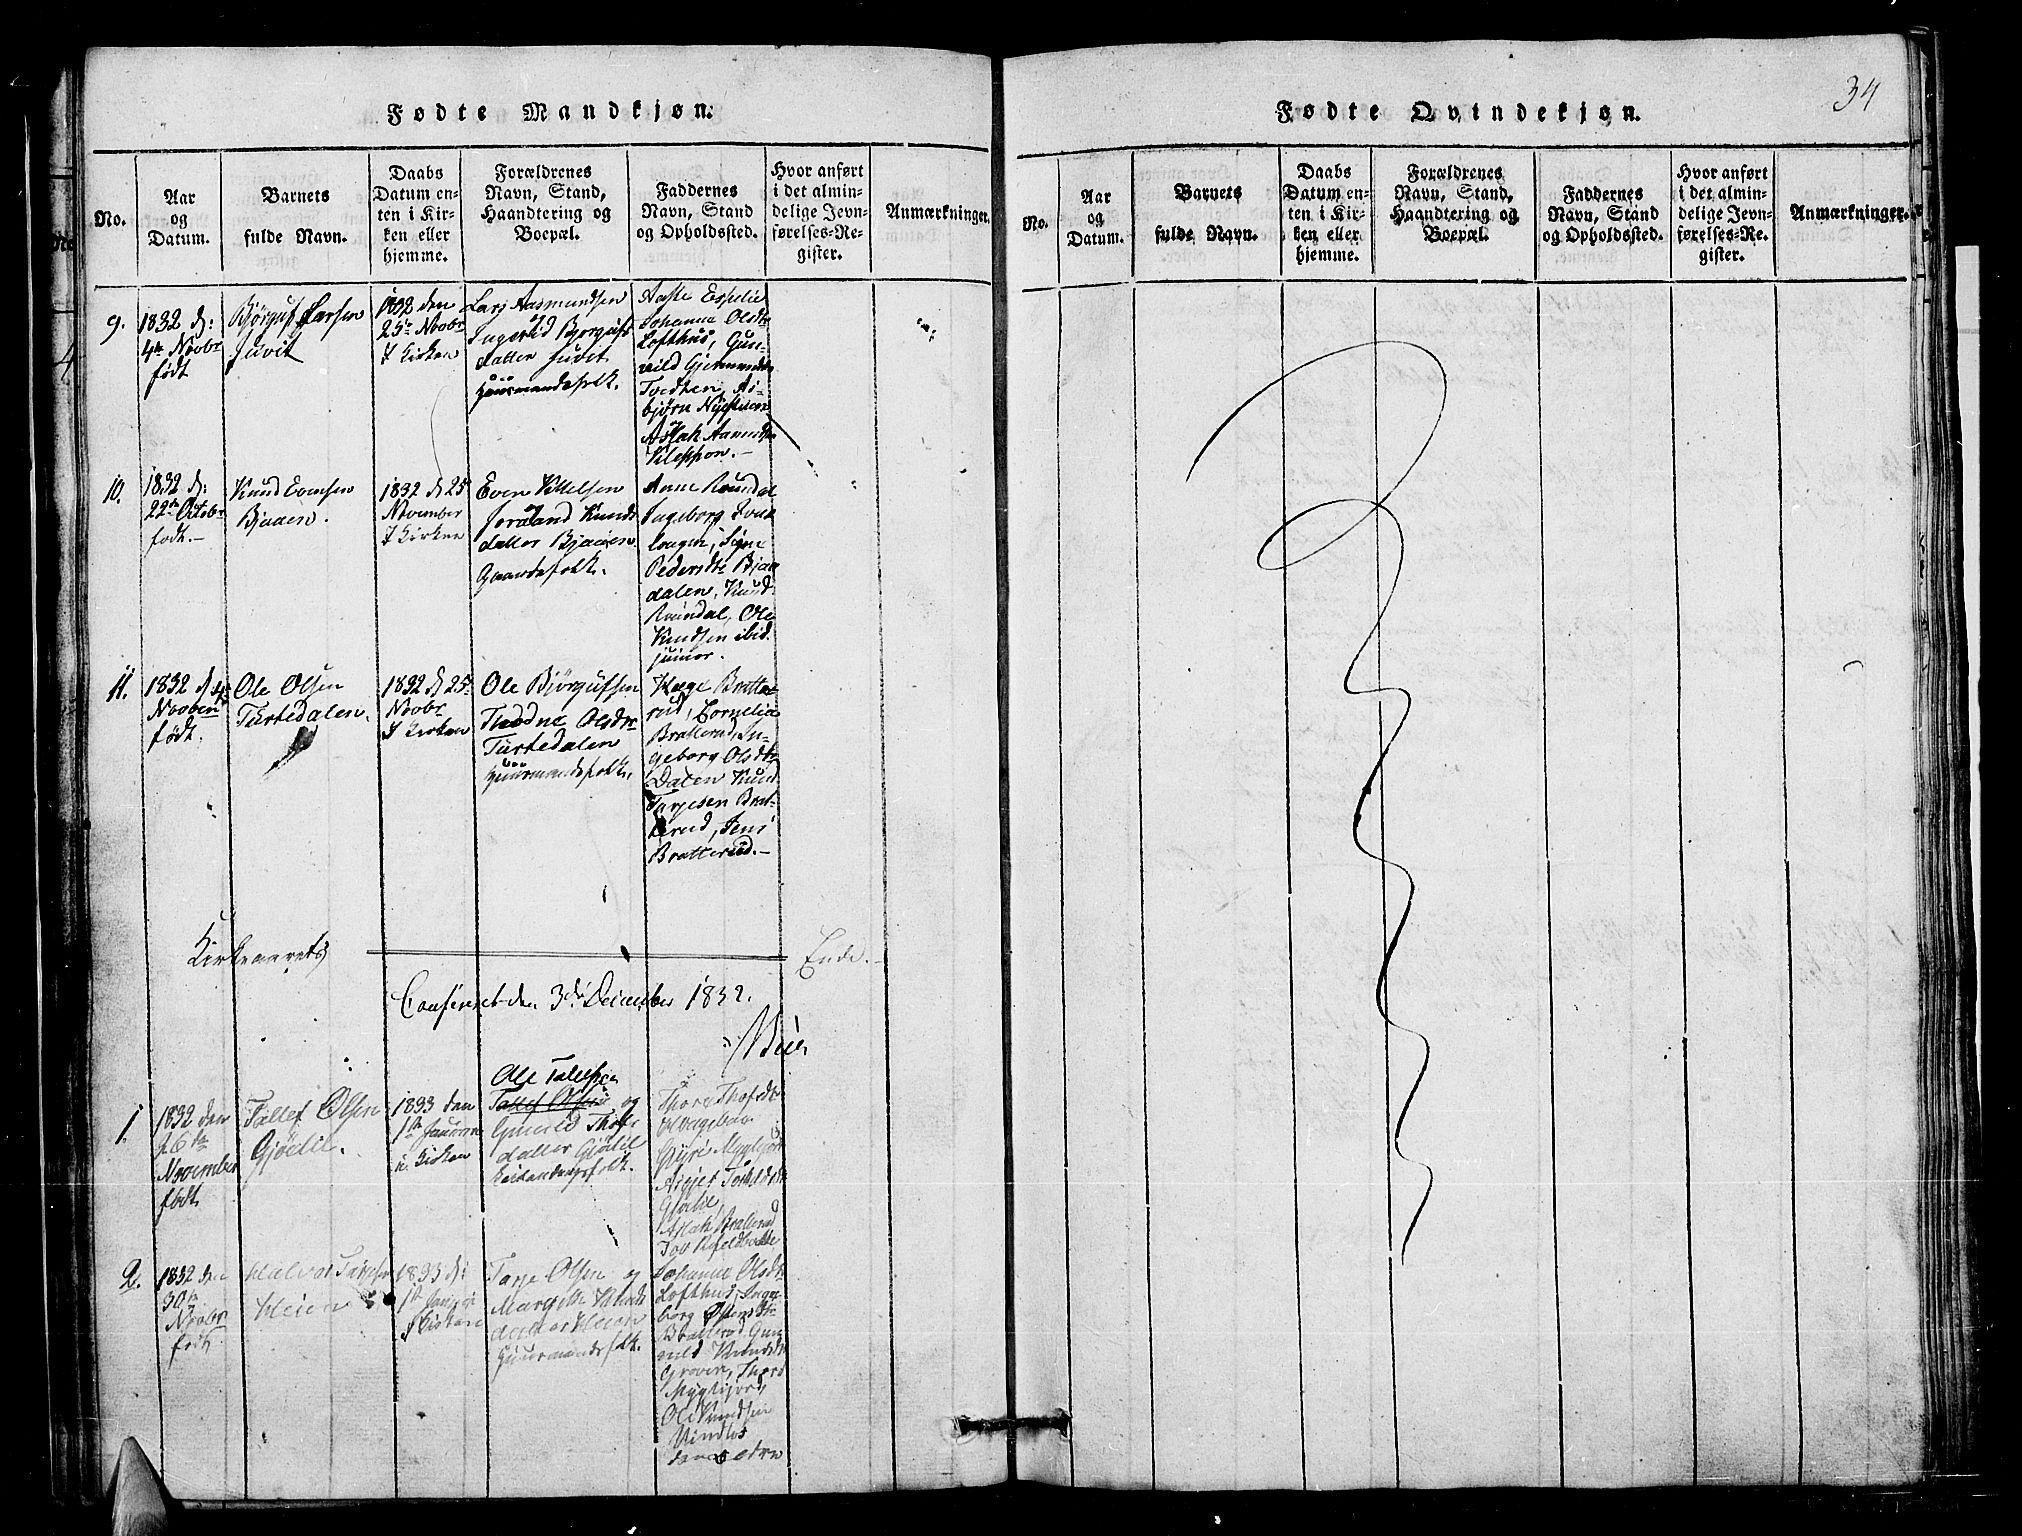 SAKO, Lårdal kirkebøker, G/Gb/L0001: Klokkerbok nr. II 1, 1815-1865, s. 34